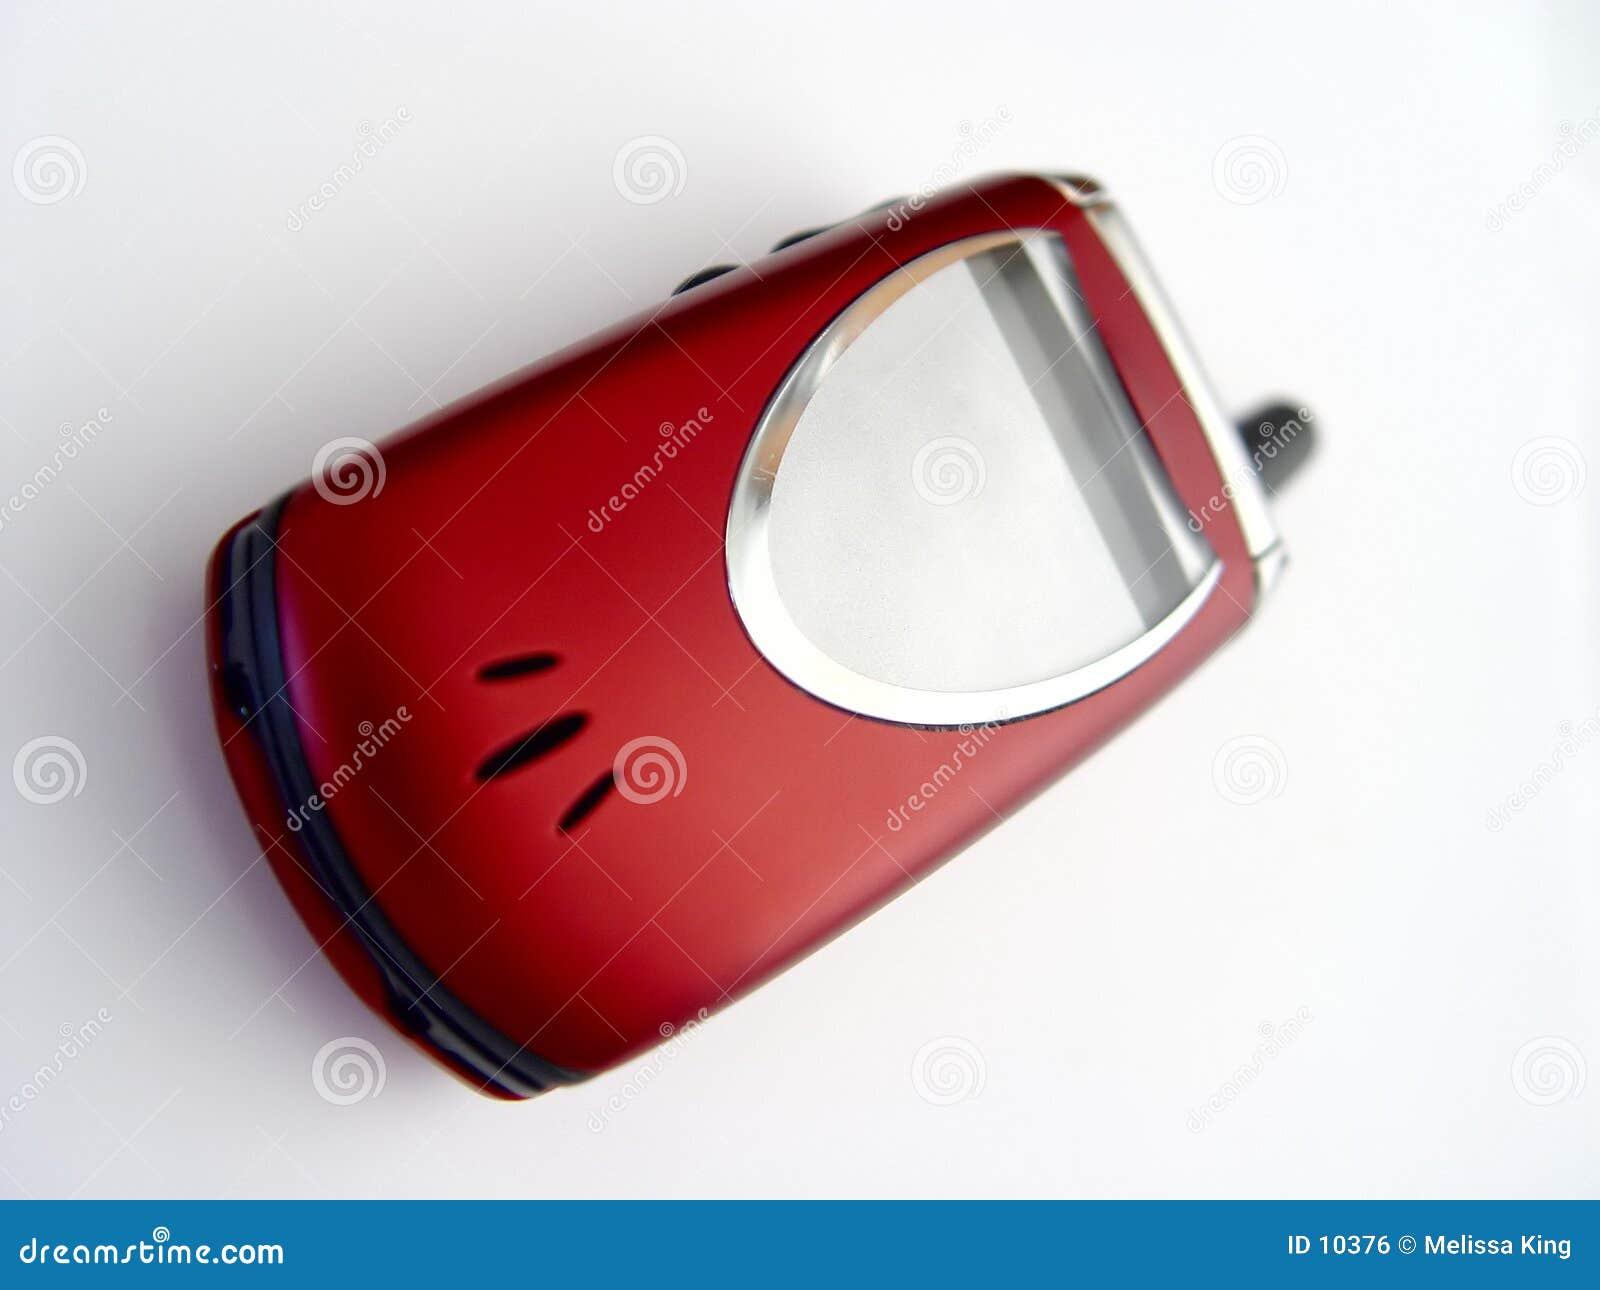 Cellular Flip Phone